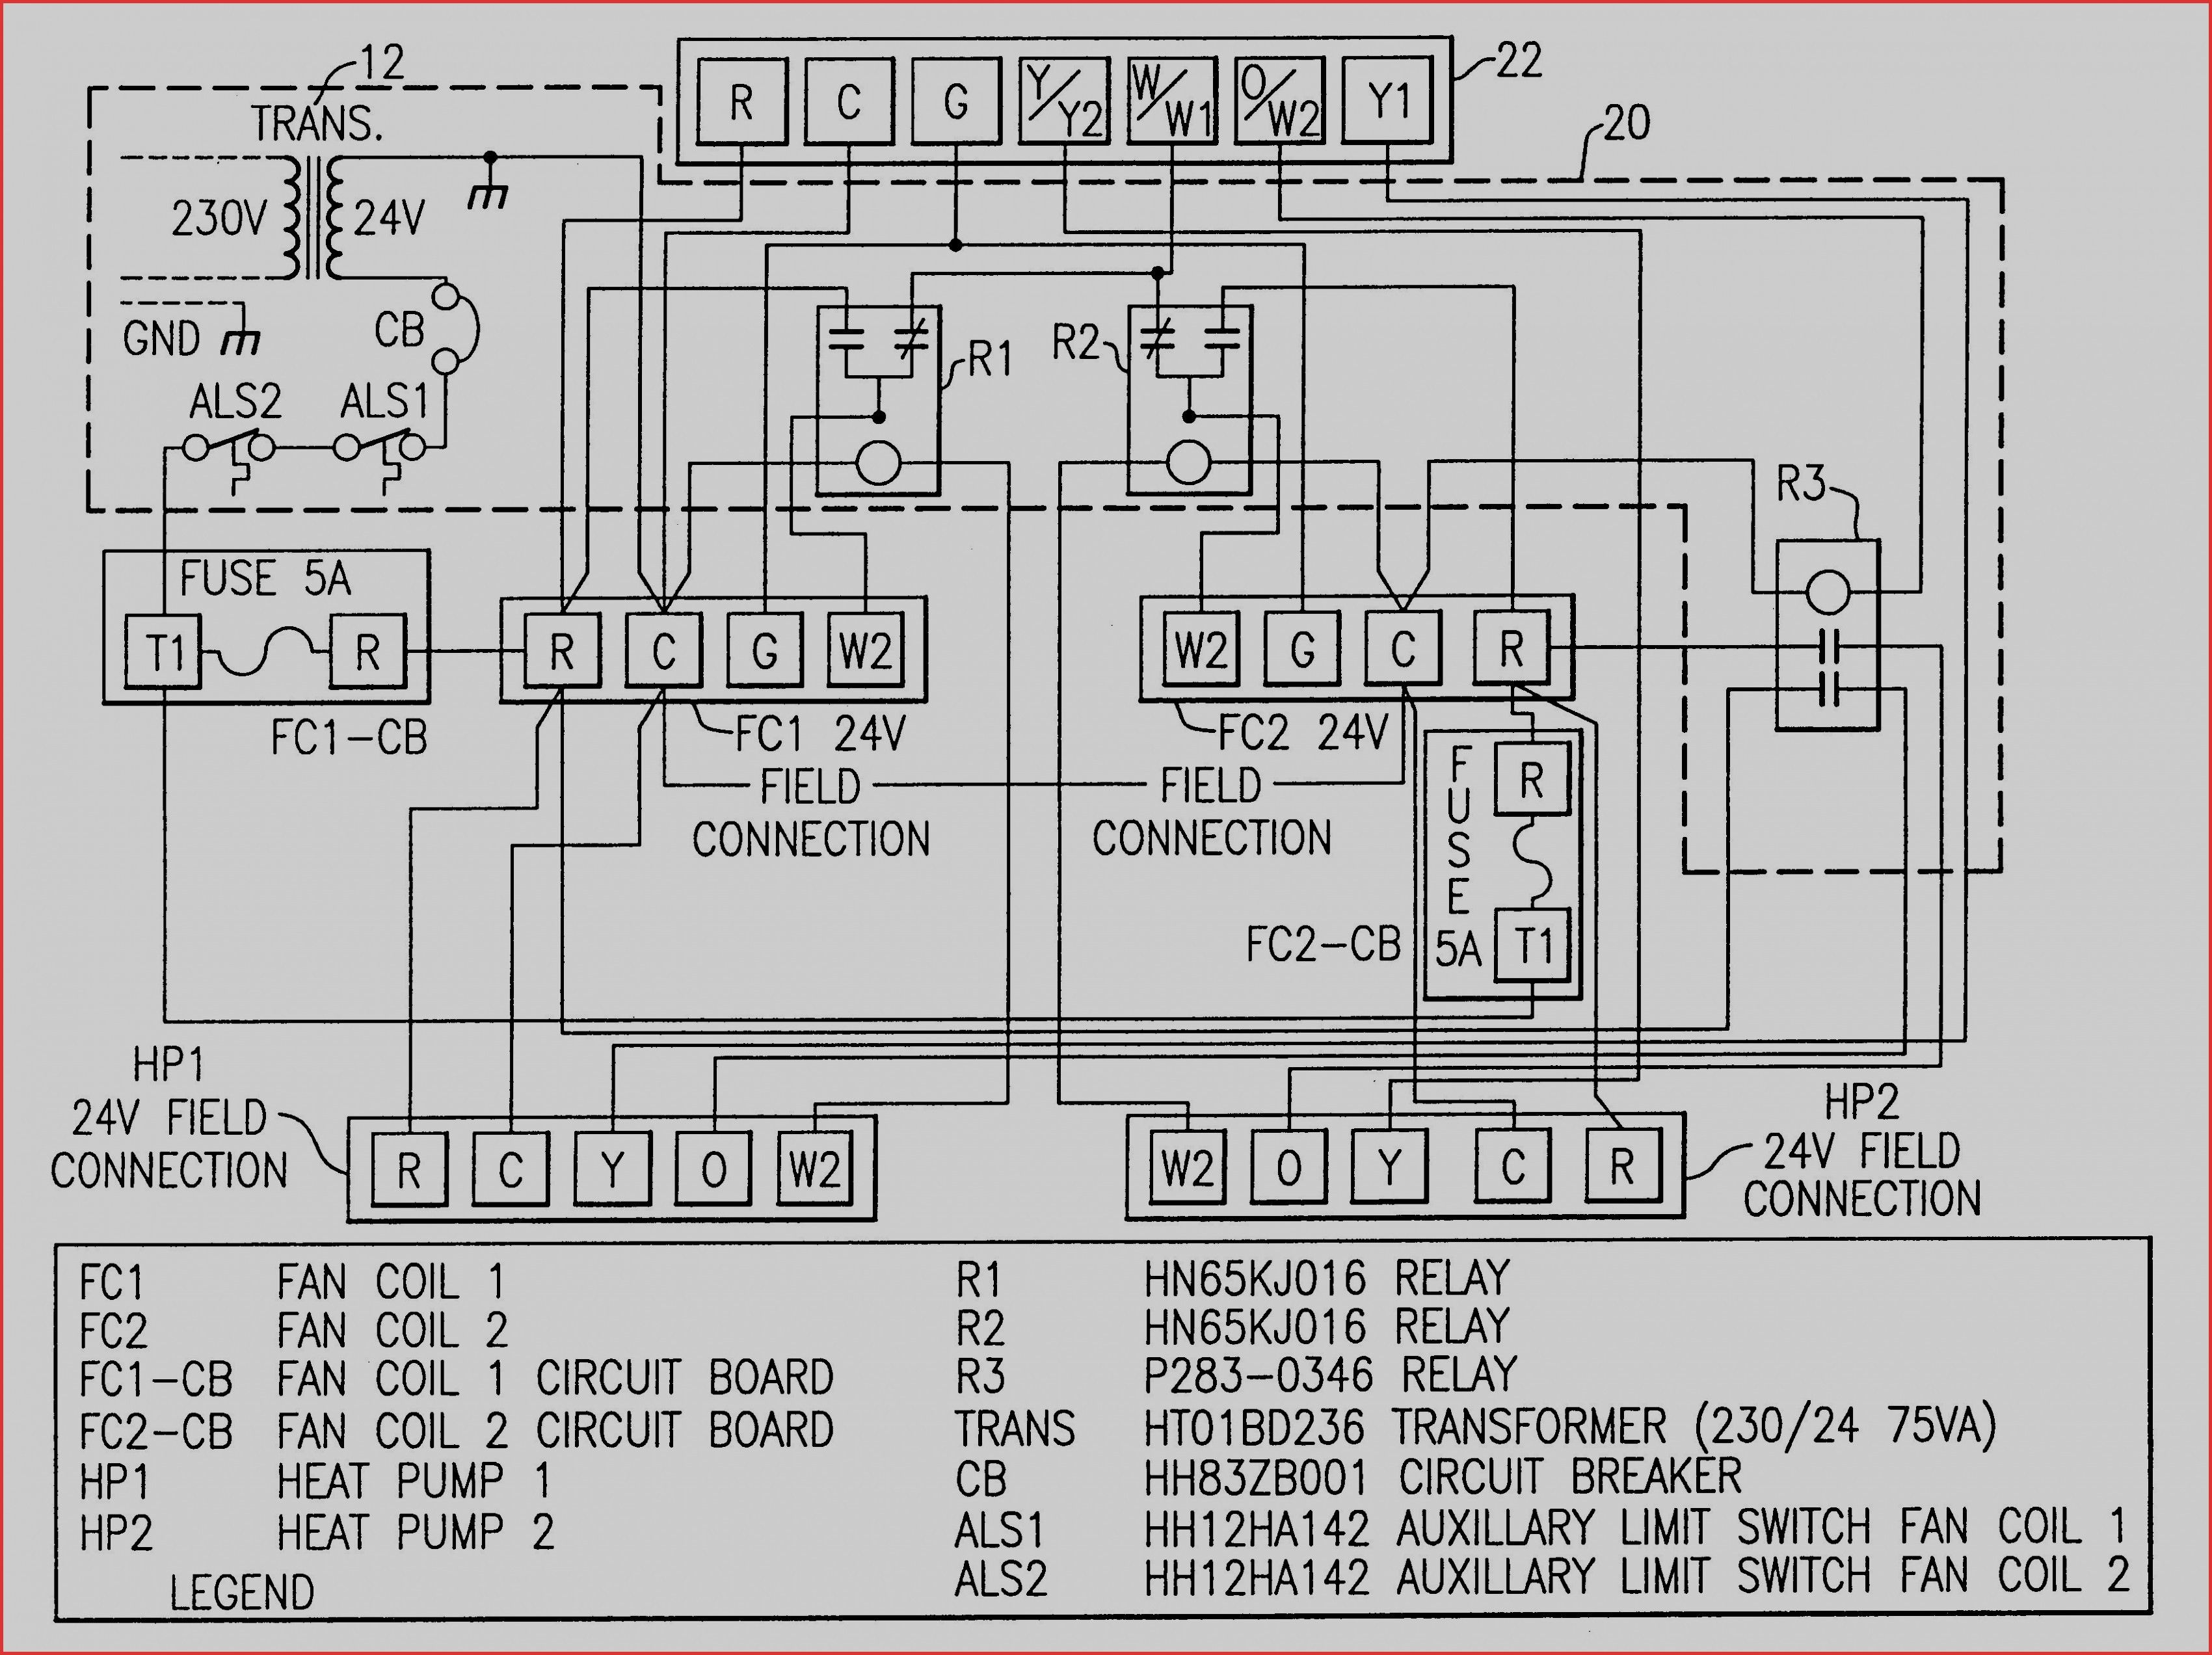 New Wiring Diagram Ruud Ac Unit Aire Acondicionado Acondicionado